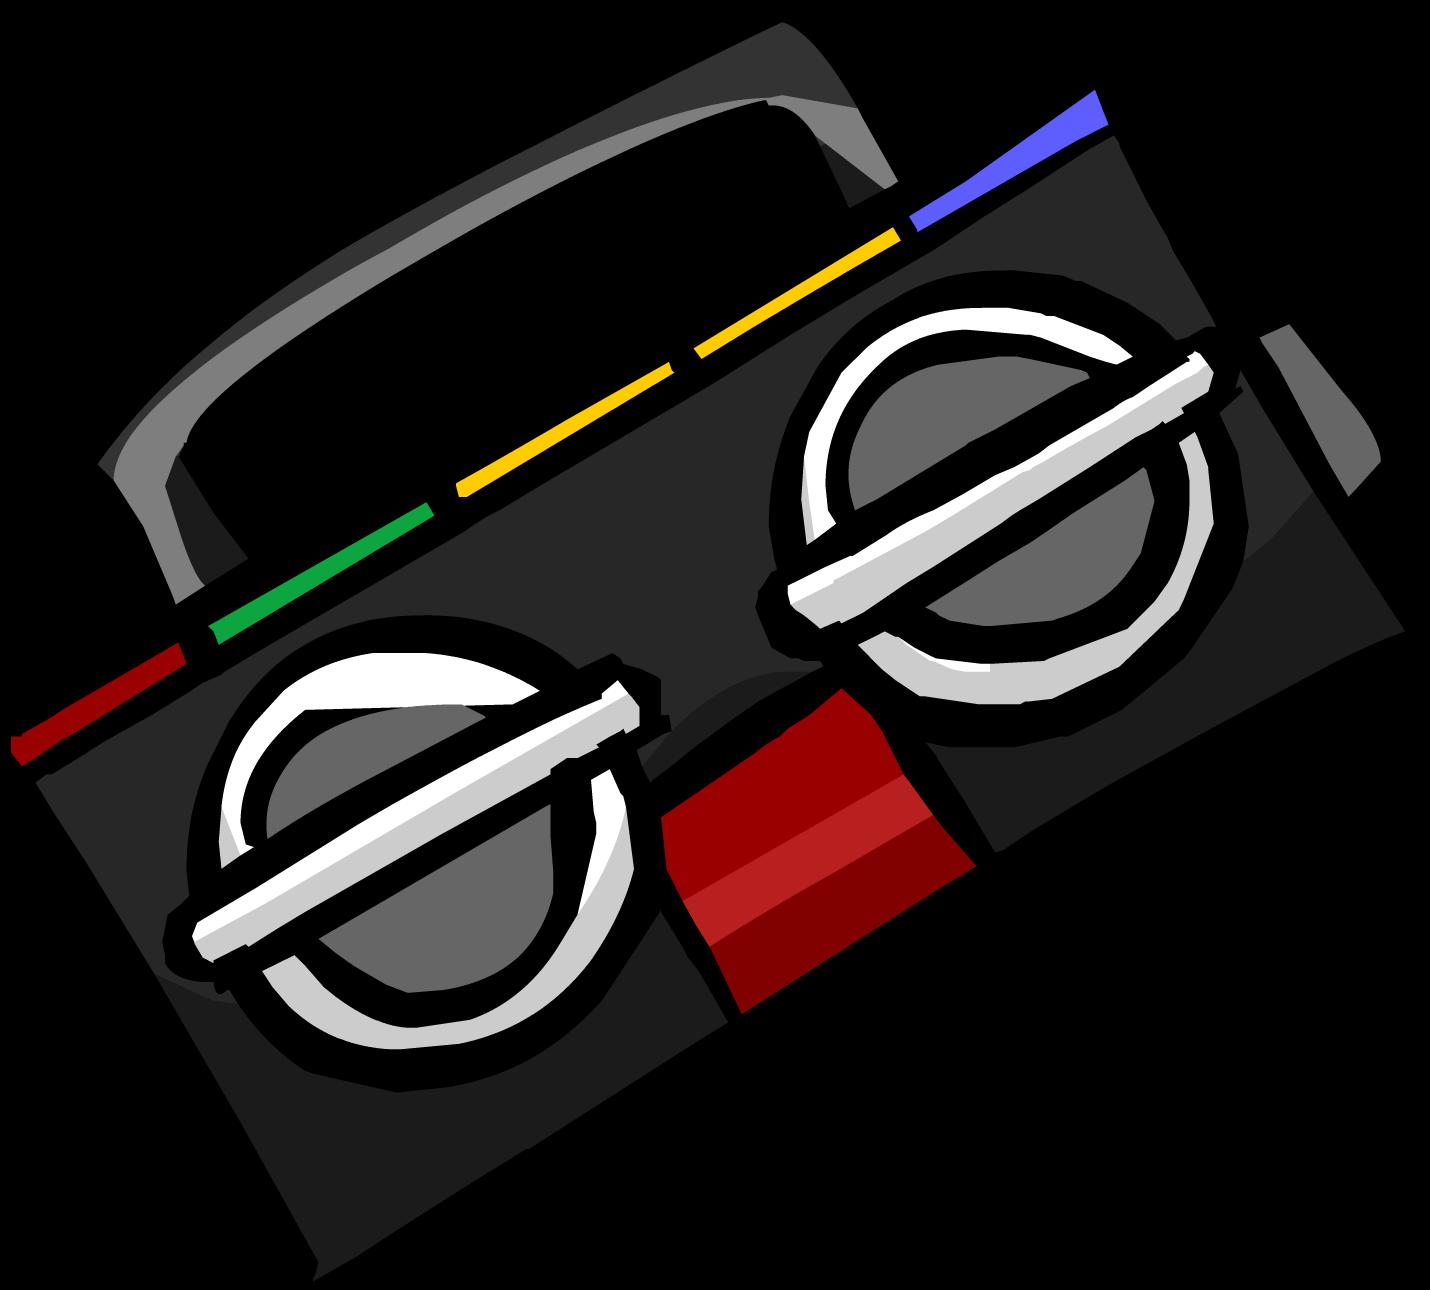 Boombox clipart beatbox. Club penguin wiki fandom